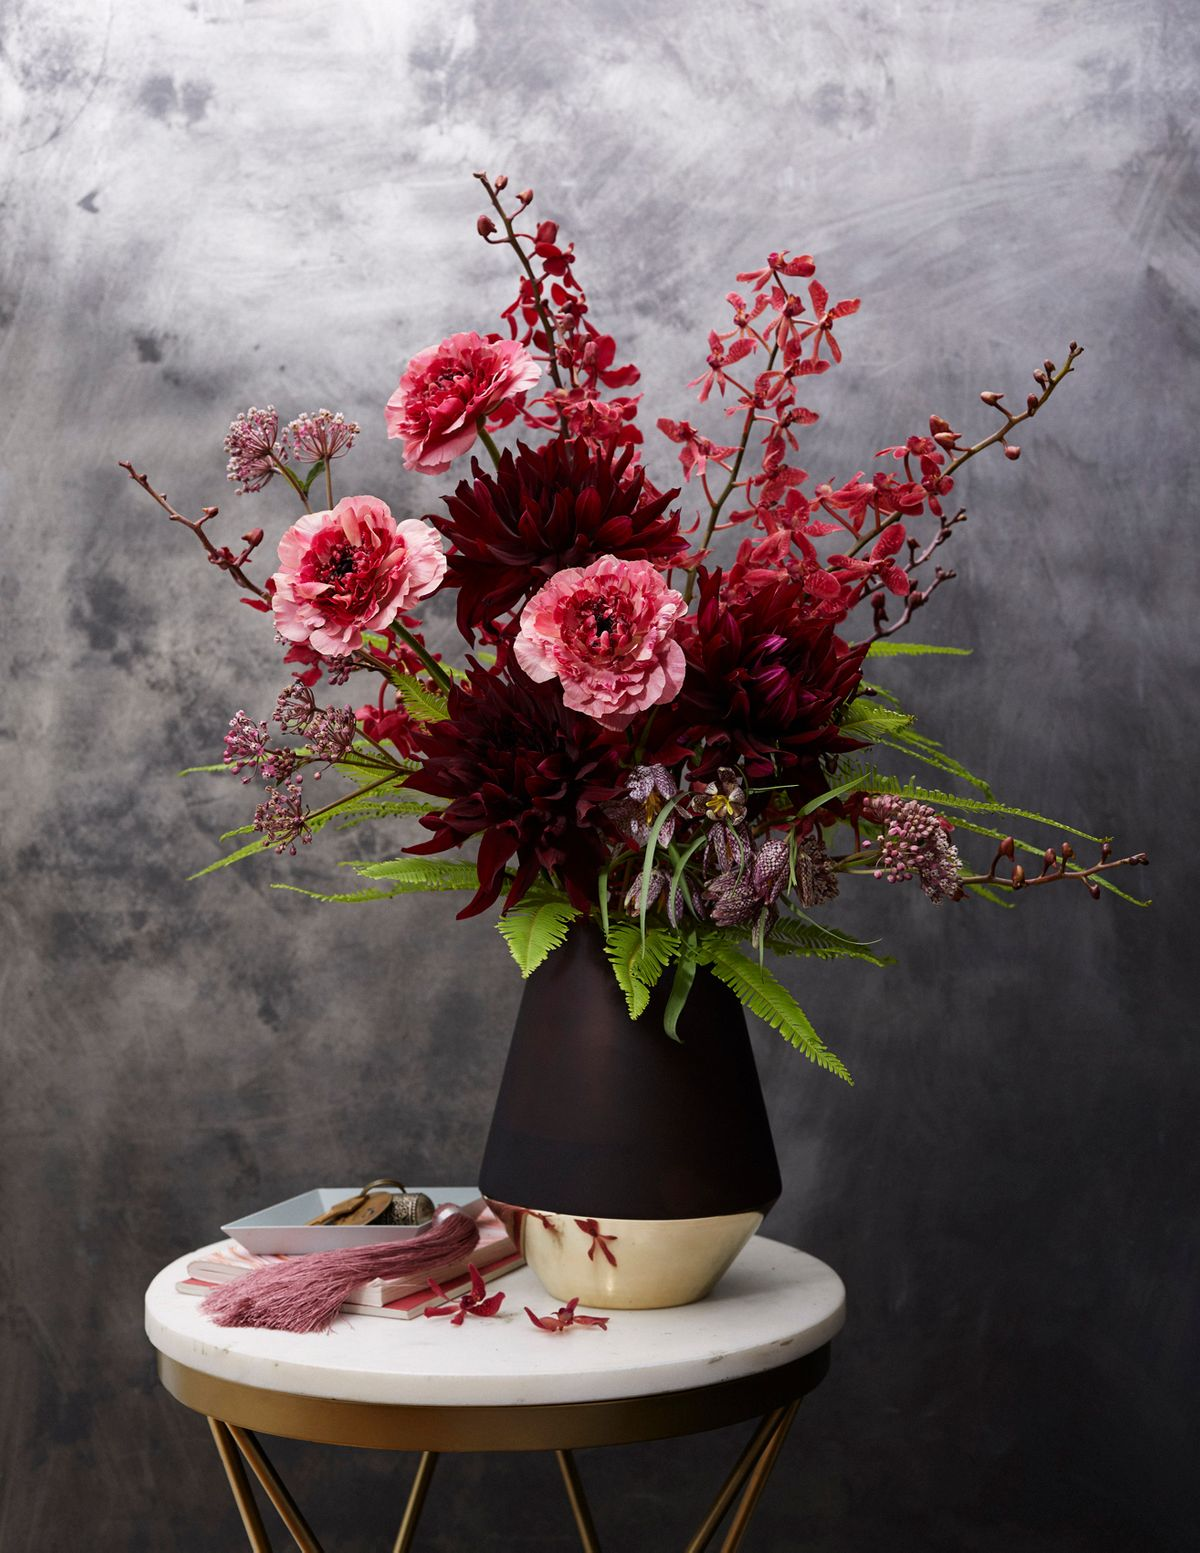 ChristopherWhite_Floral Study_6.jpg